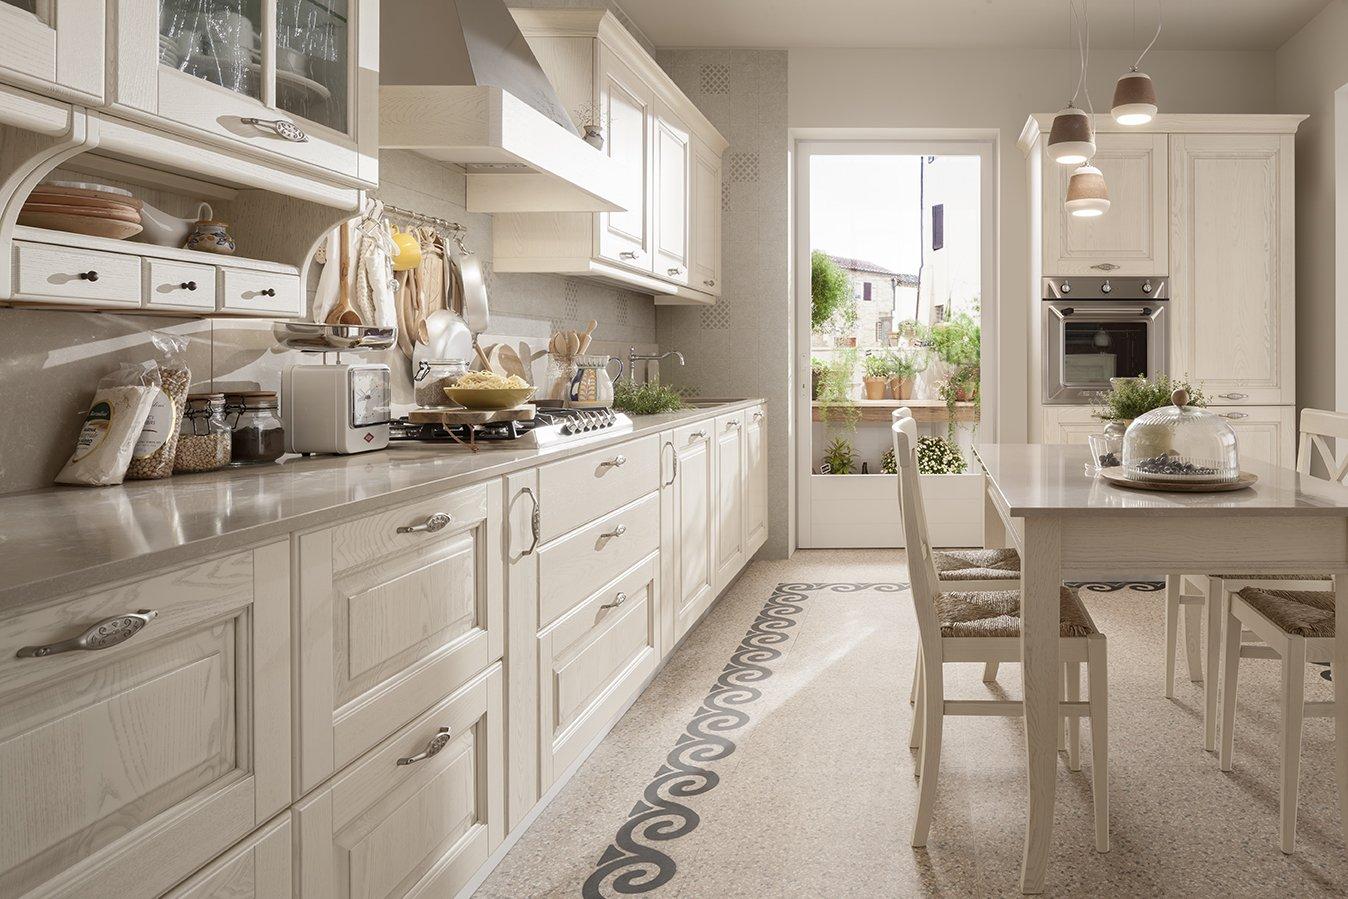 Veneta cucine tradizione memory cucine con top extra - Ante per cucina laccate prezzi ...